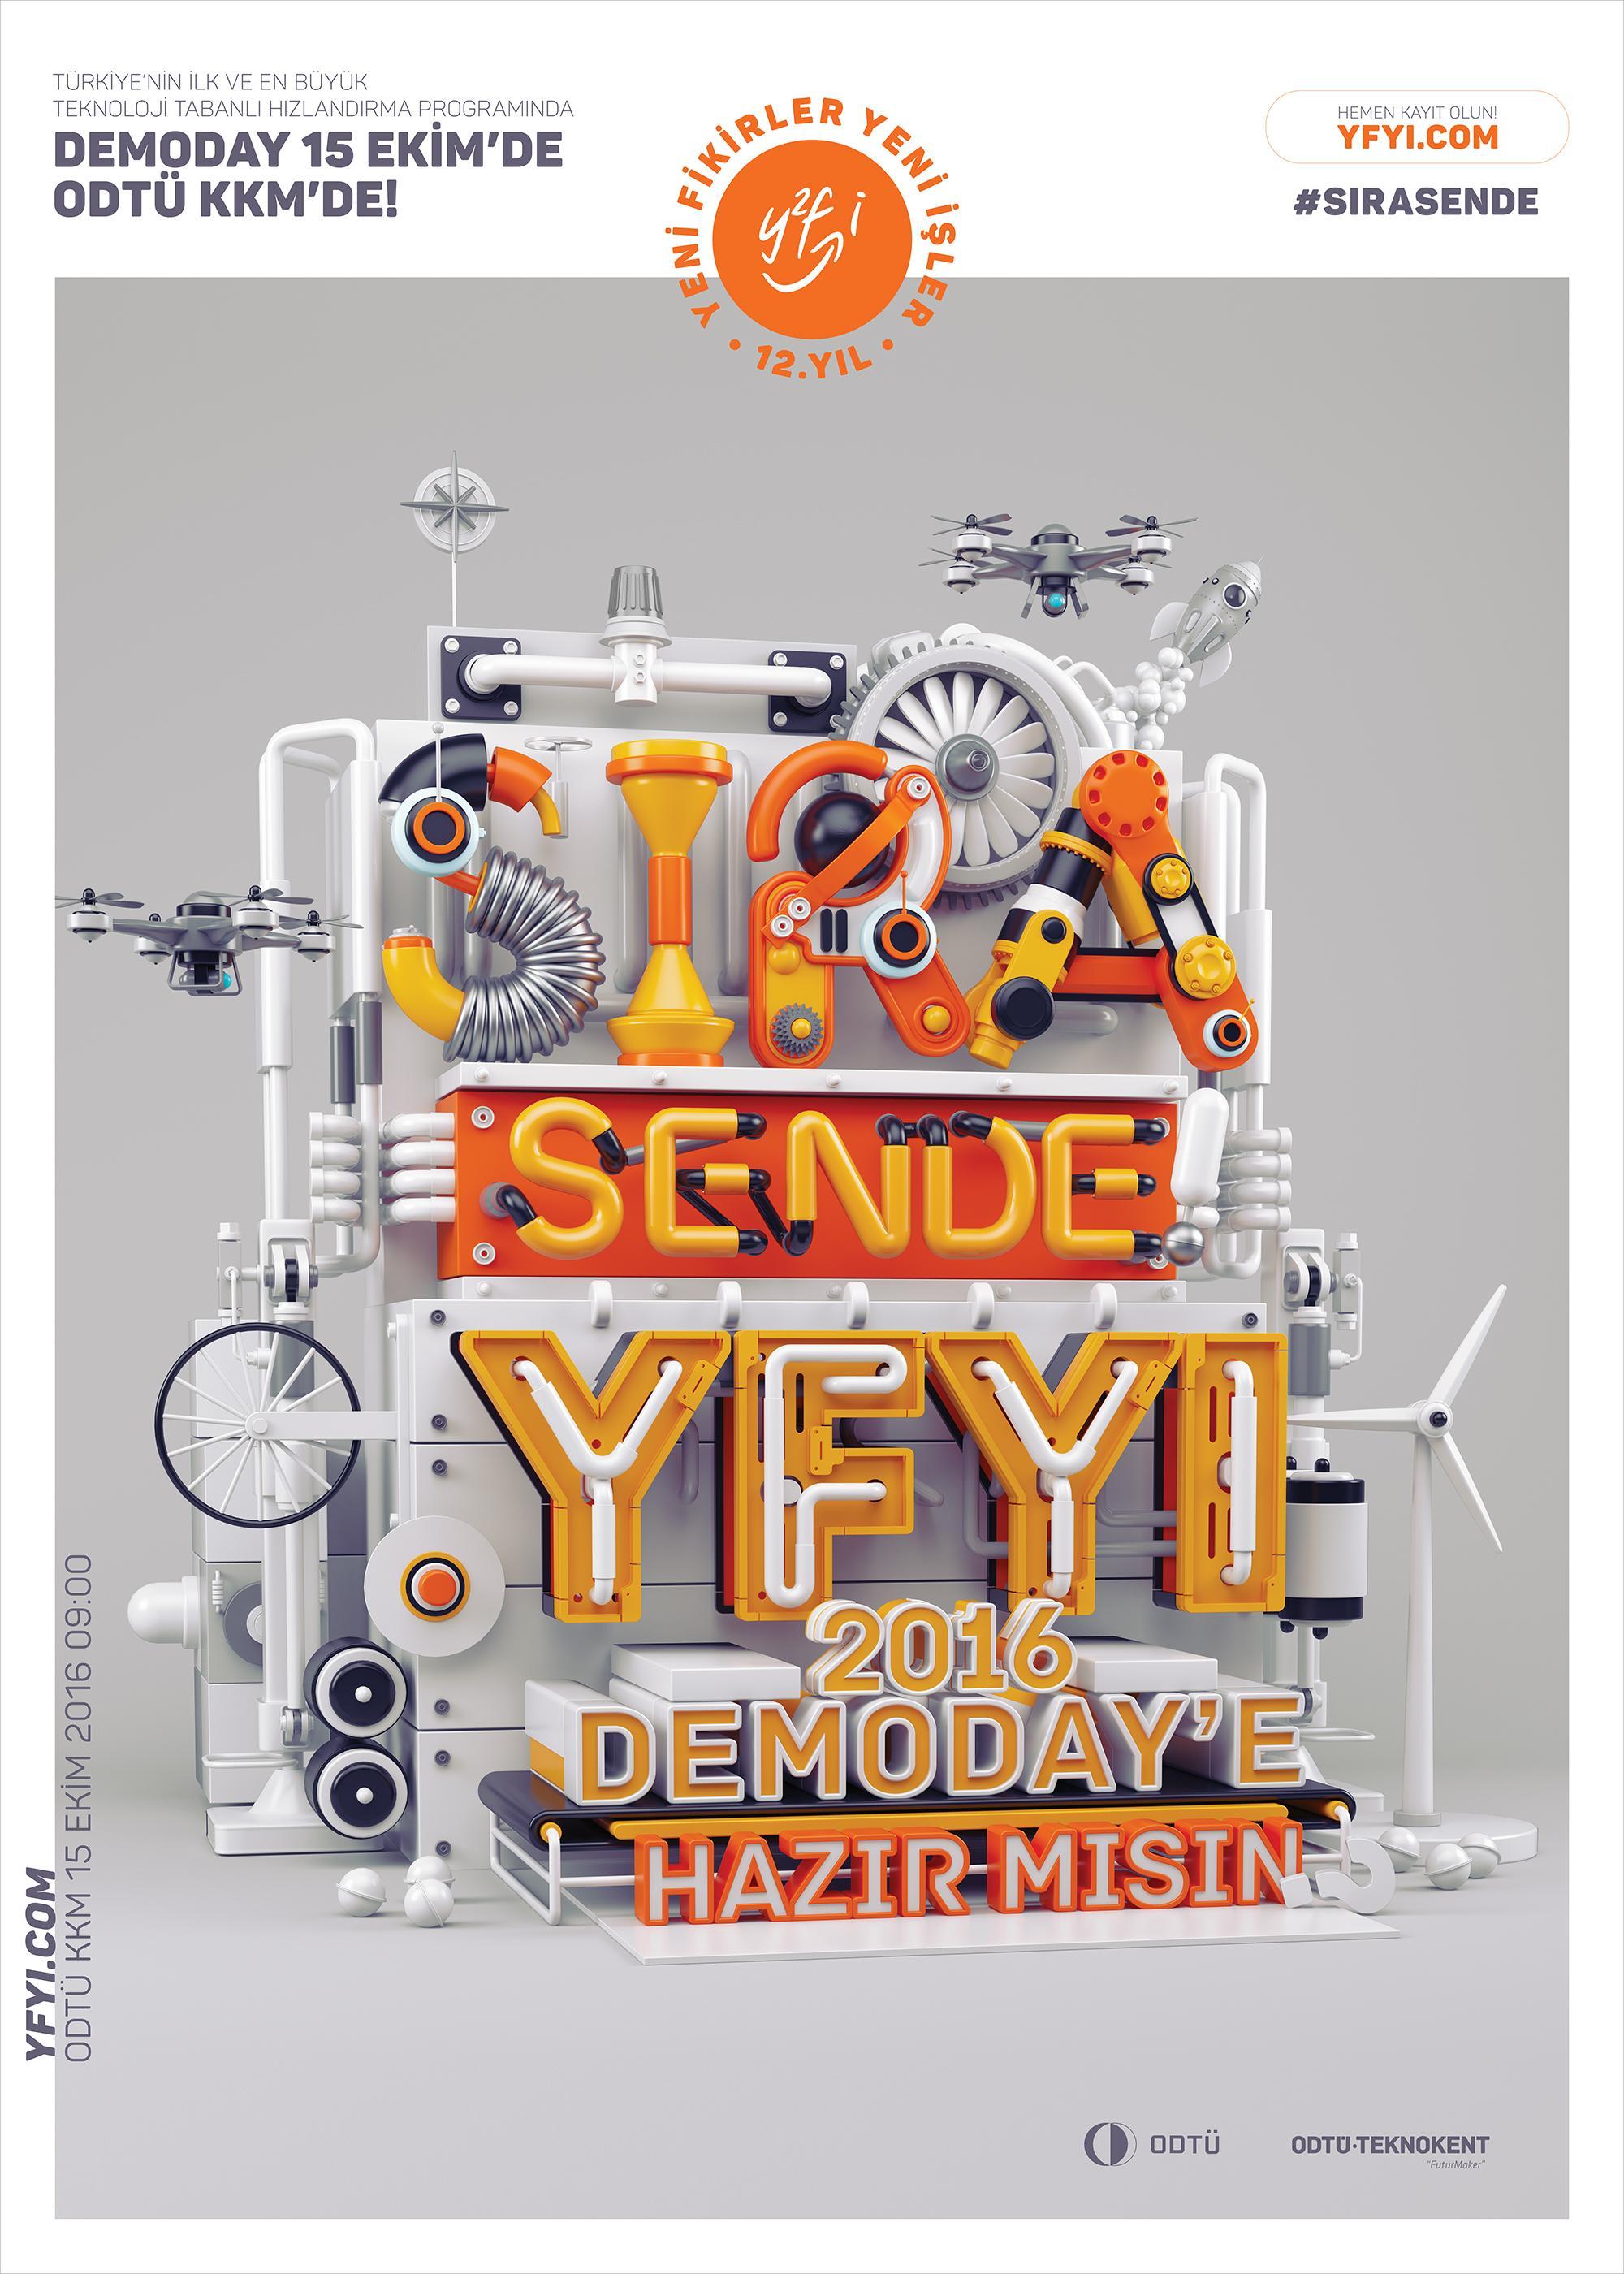 print-creatif-inspiration-olybop-nov-2016-114